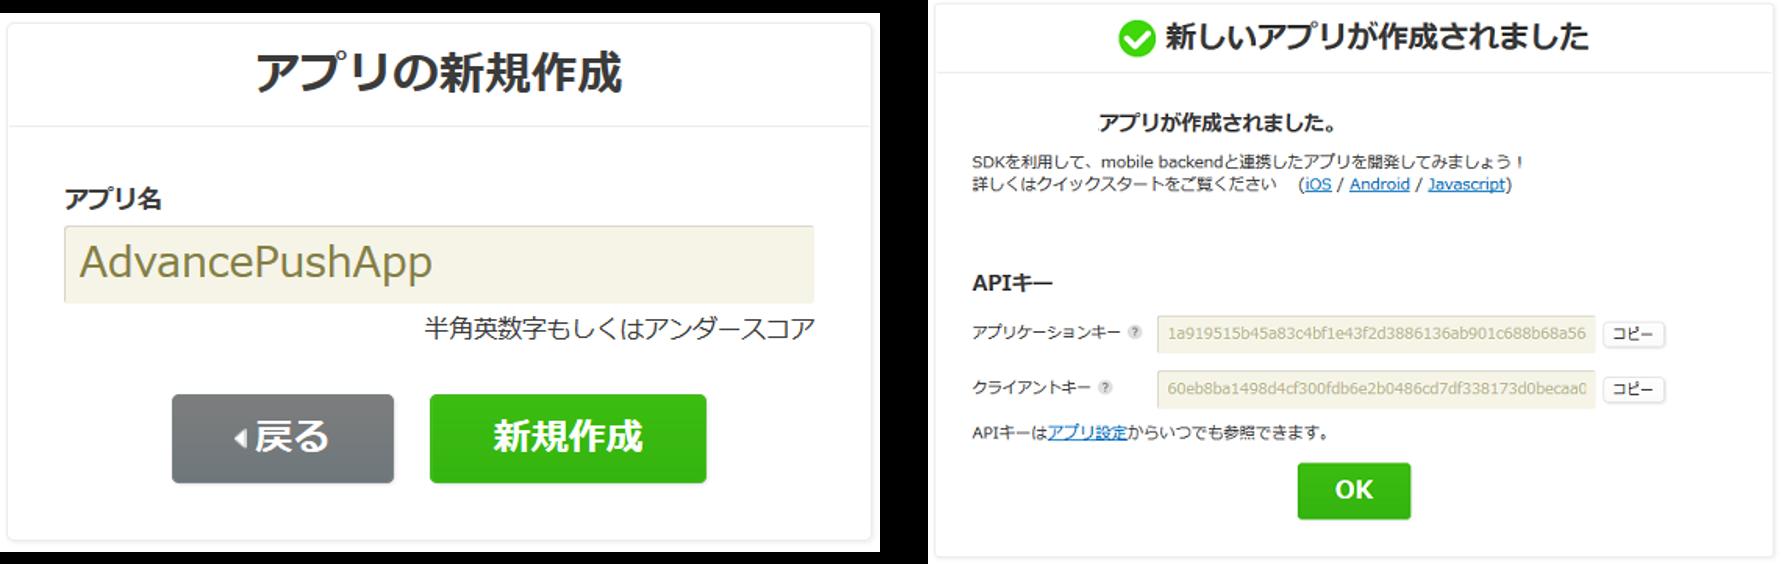 mBaaSアプリ作成.png